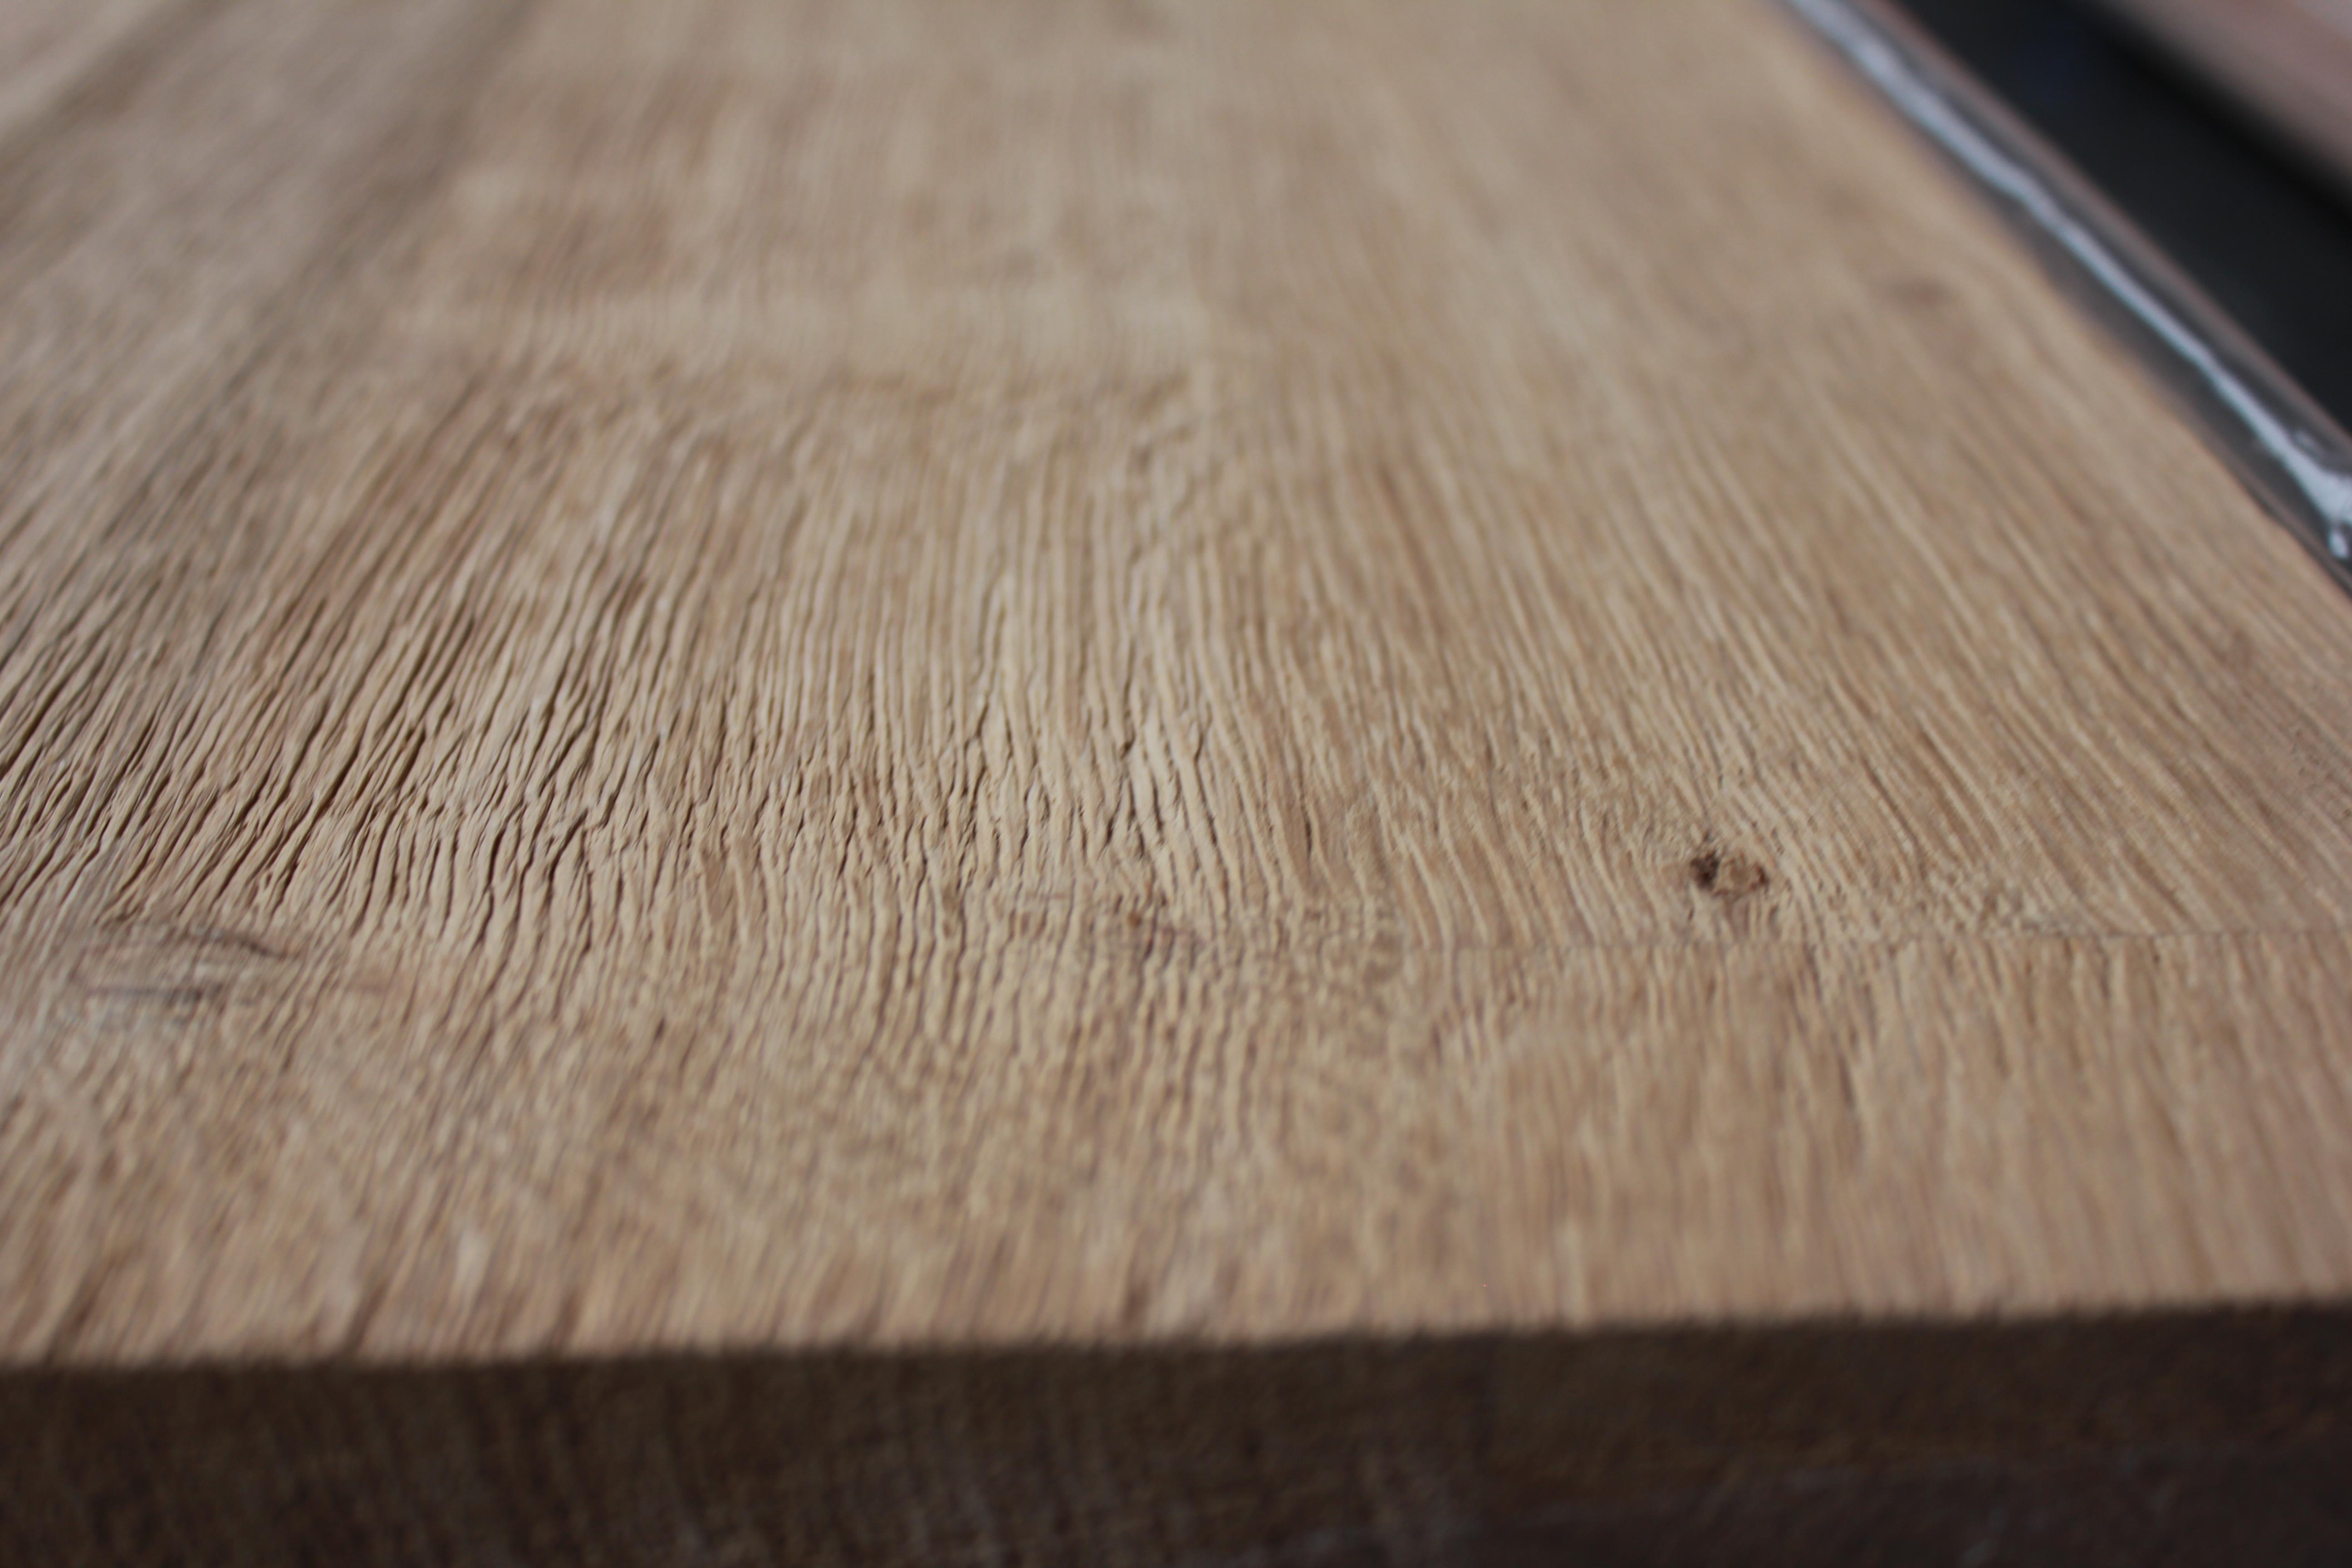 holz ahmerkamp immer eine holzidee besser neu am lager 40 45 mm eiche geb rstet rustikal. Black Bedroom Furniture Sets. Home Design Ideas